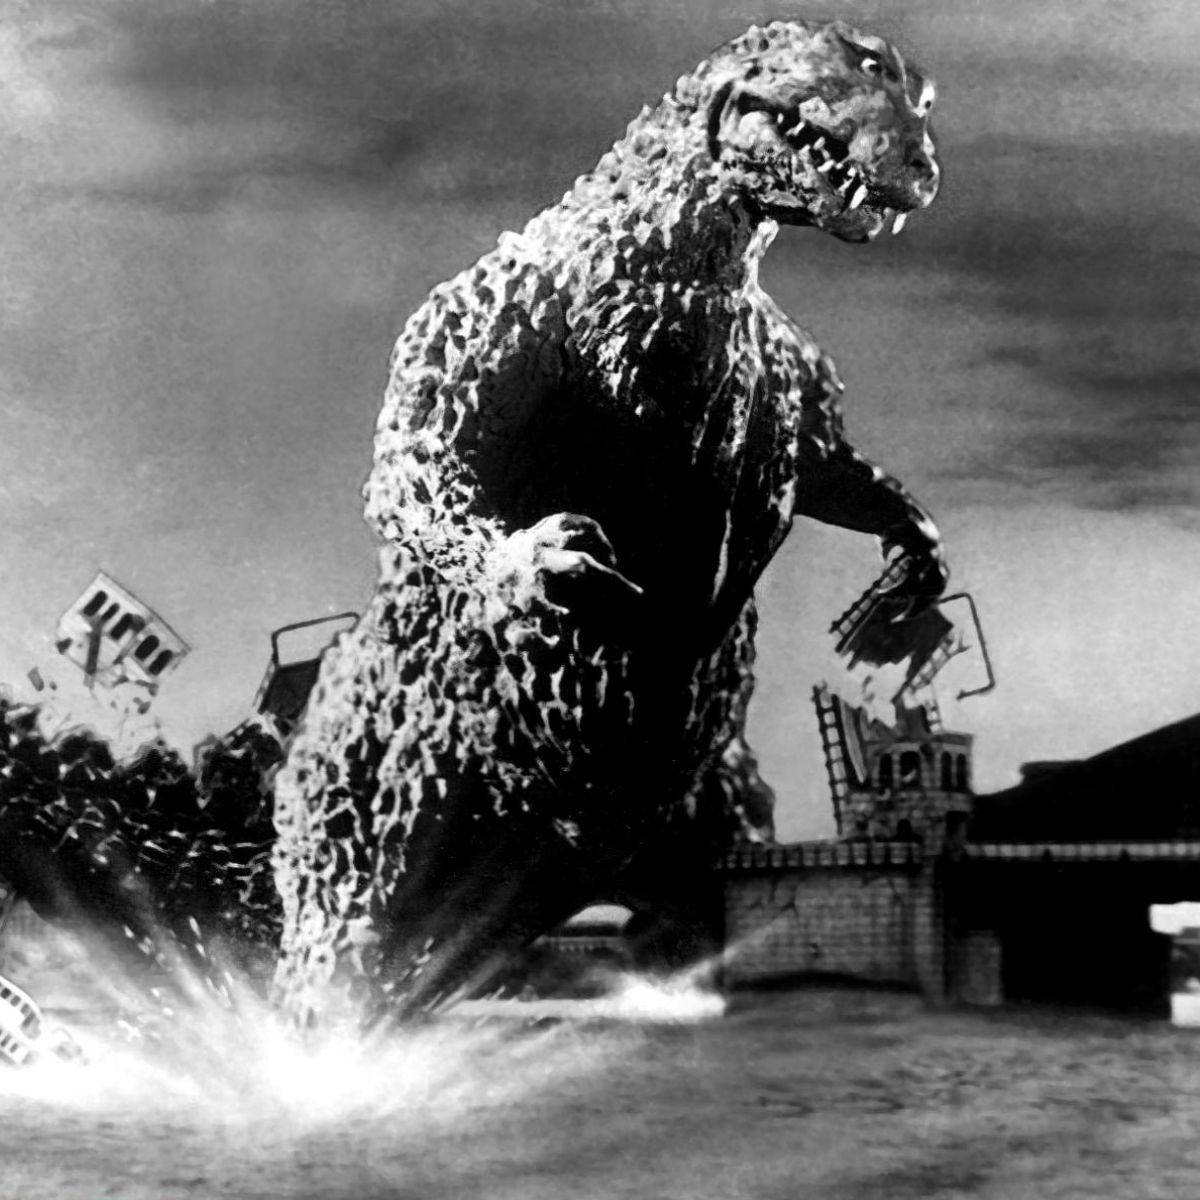 Magnolia at the Modern presents Godzilla